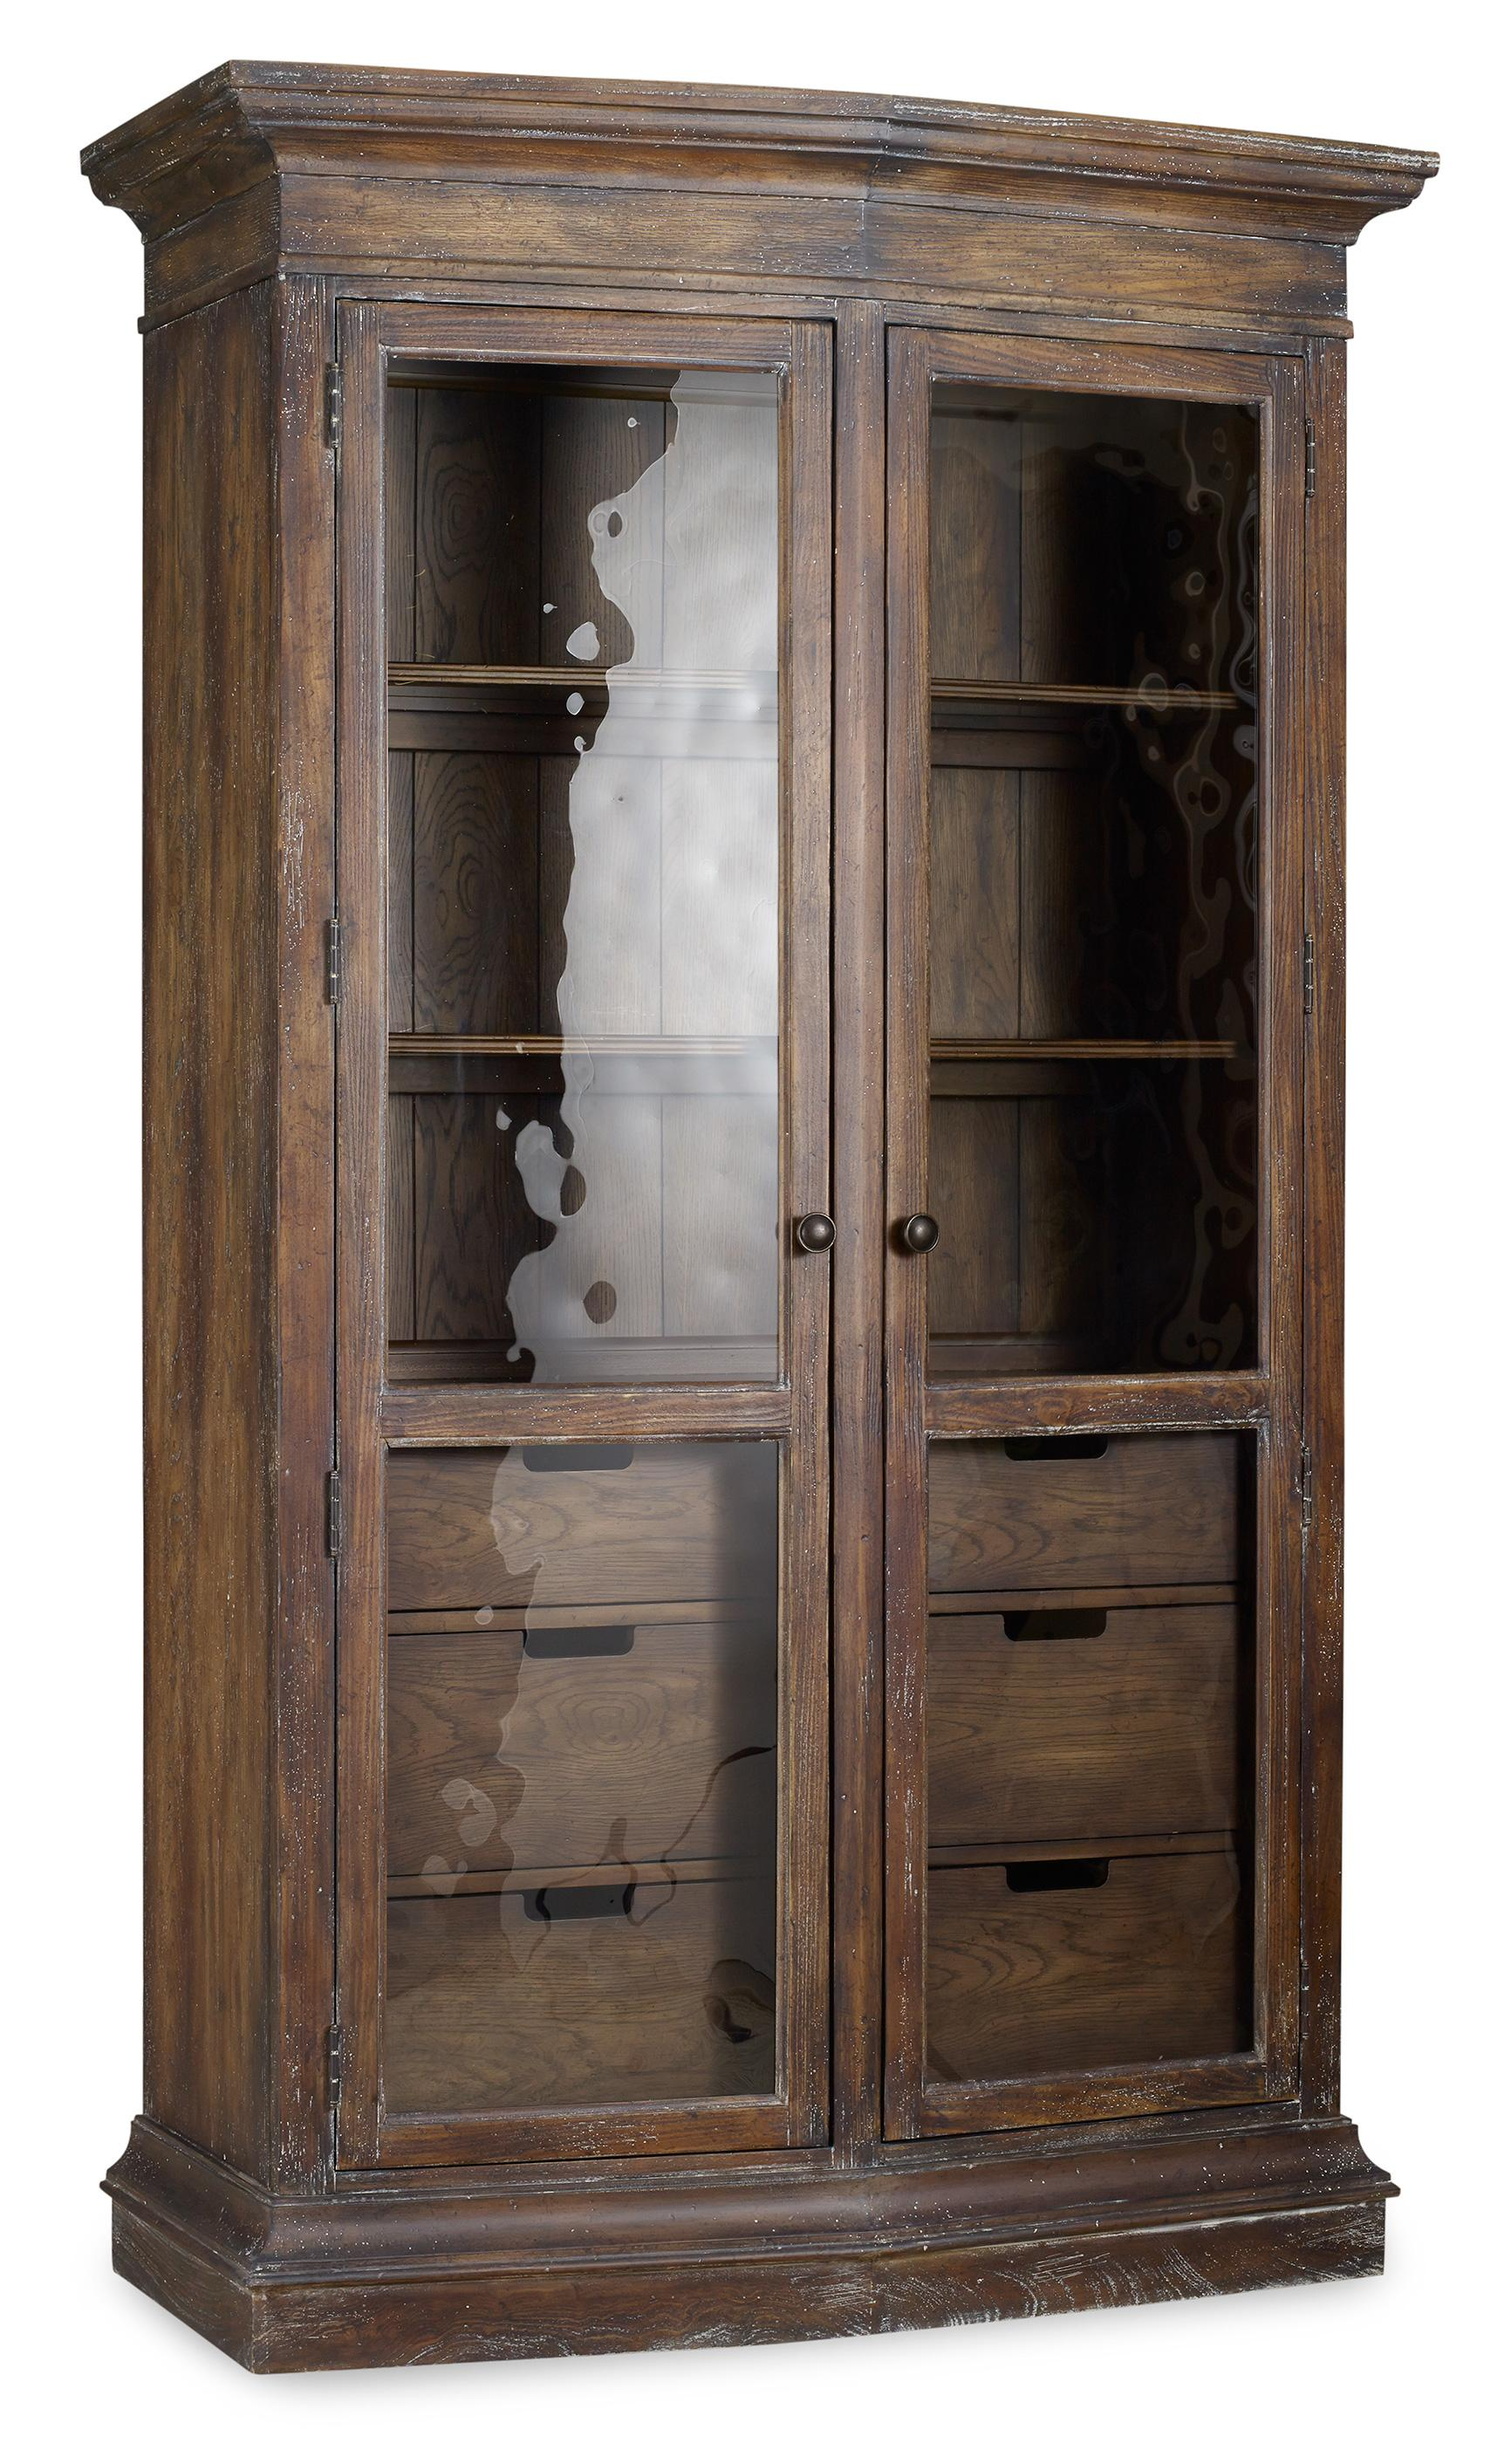 Hooker Furniture Willow Bend Display Cabinet - Item Number: 5343-75906